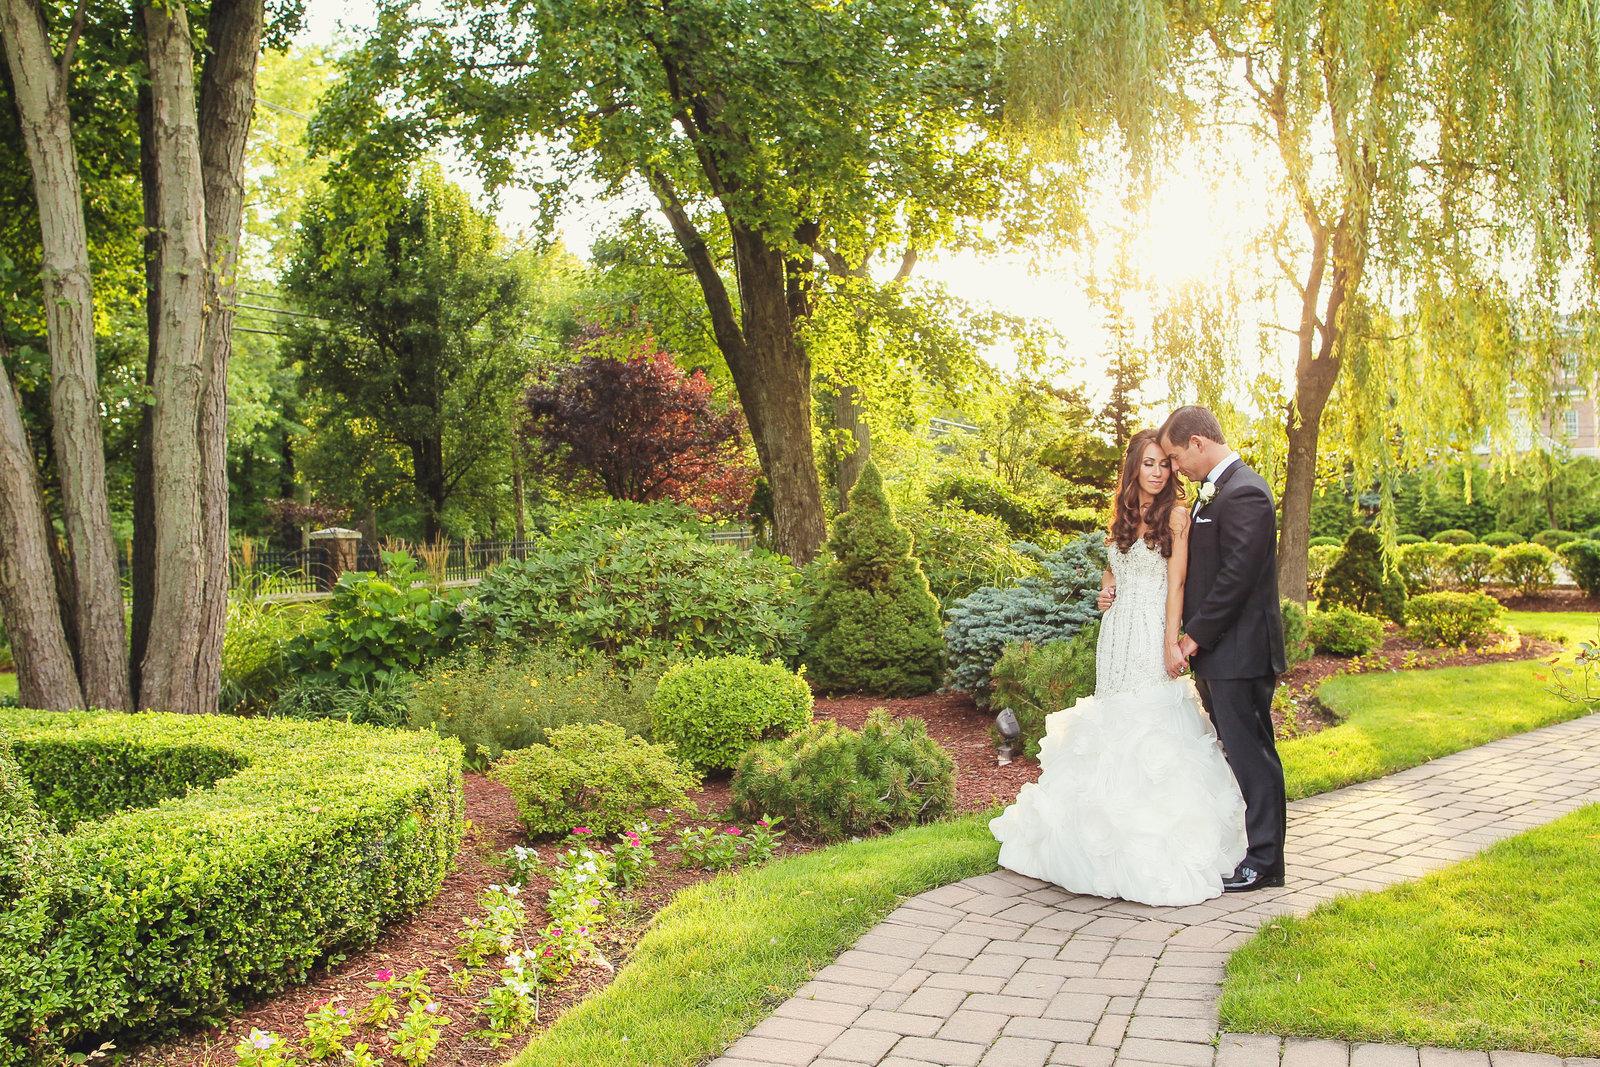 048_Vanessa Joy Photography_New Jersey Wedding Photographer_Portraits